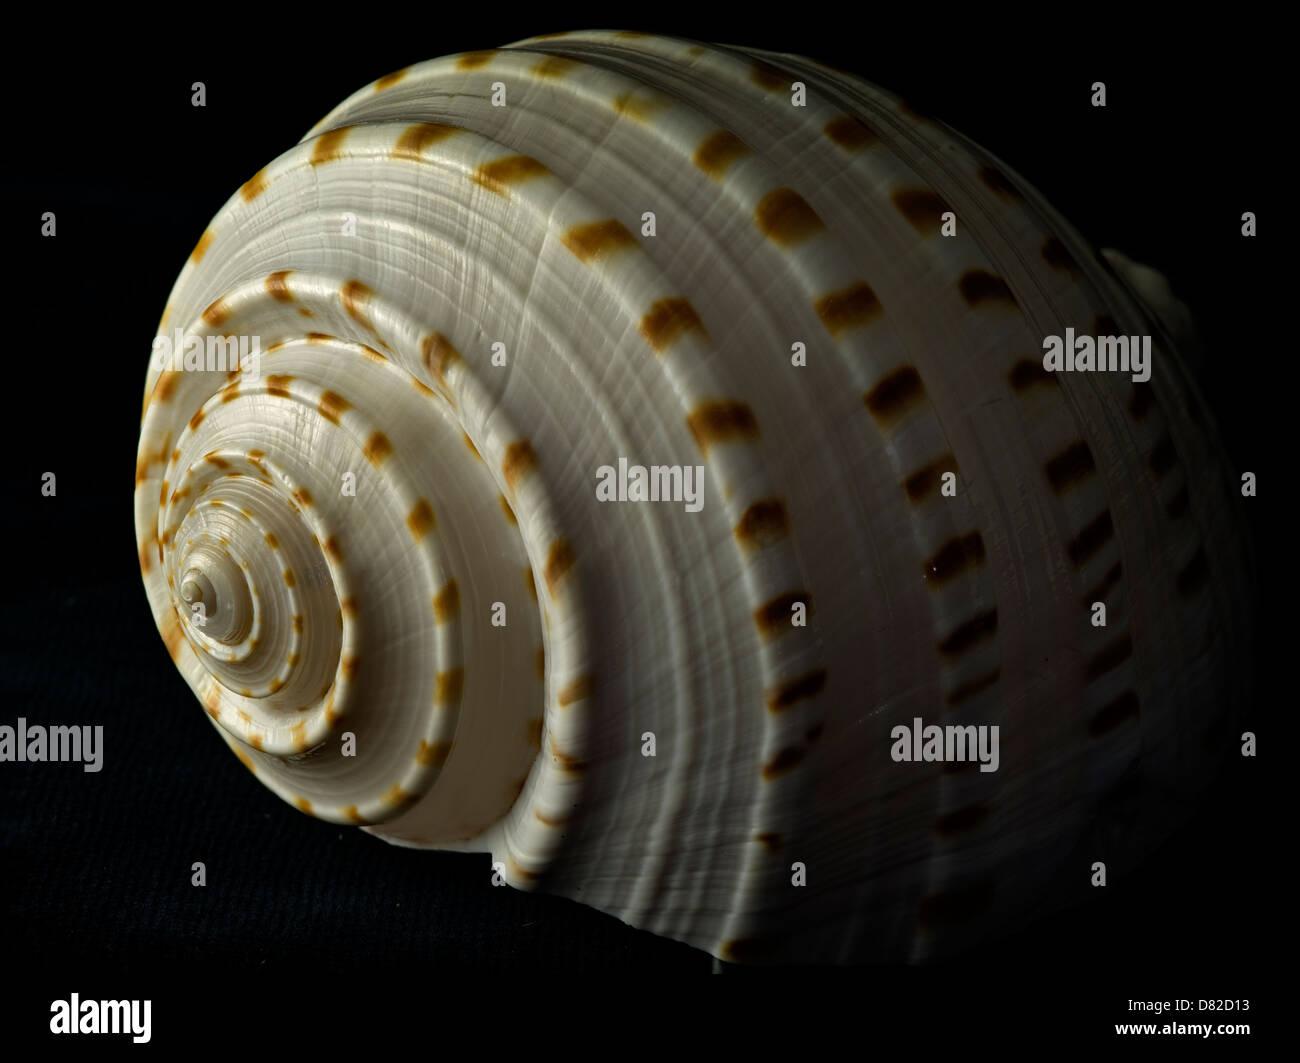 seashell stockfotos seashell bilder alamy. Black Bedroom Furniture Sets. Home Design Ideas